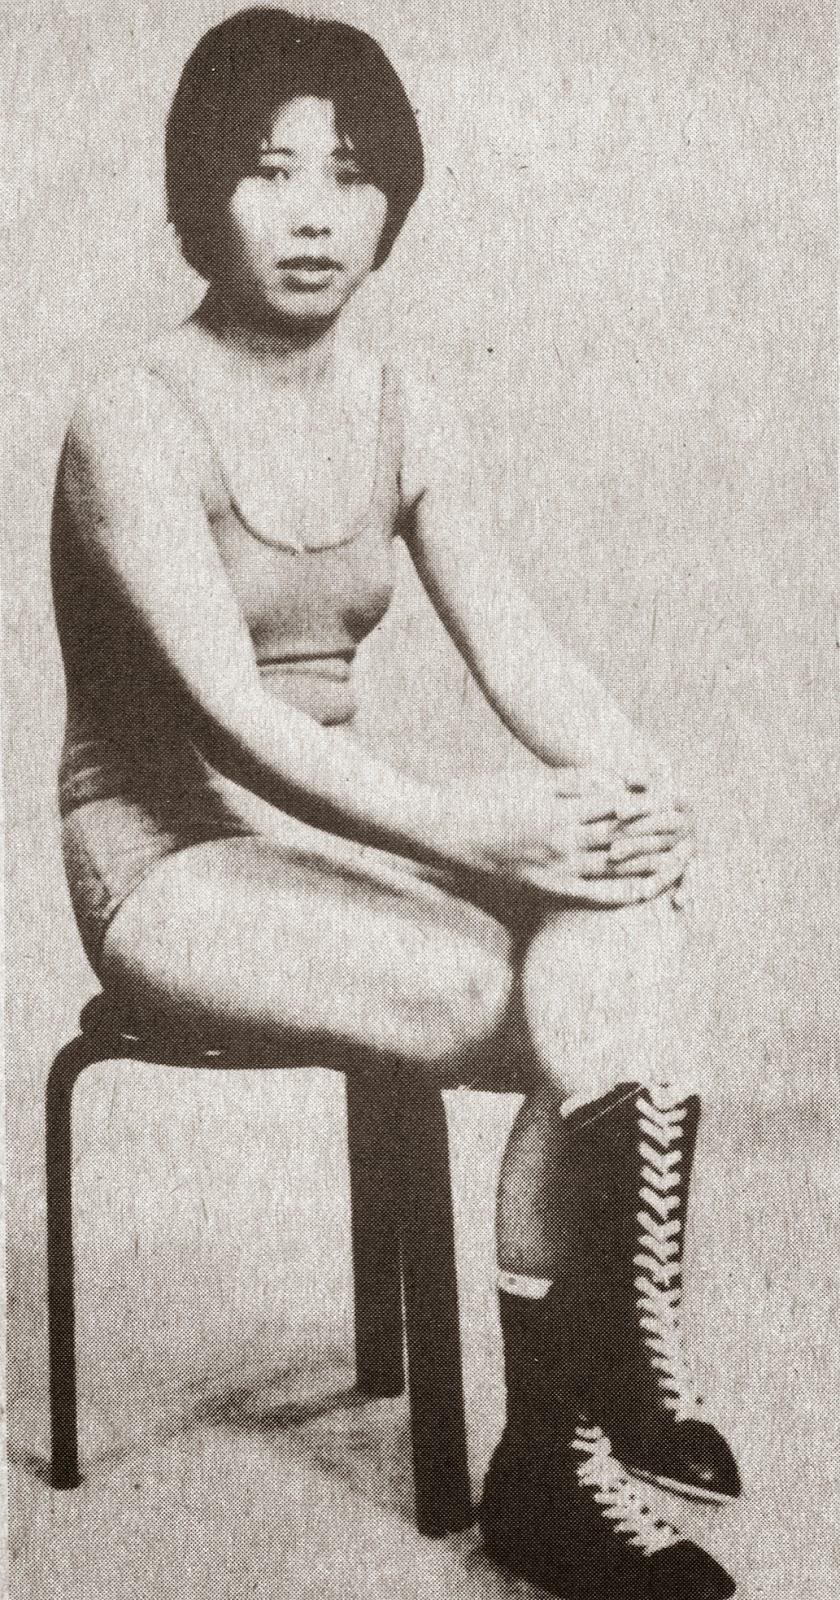 joshi+puroresu 1973 women wrestling Japanese girl wrestlers